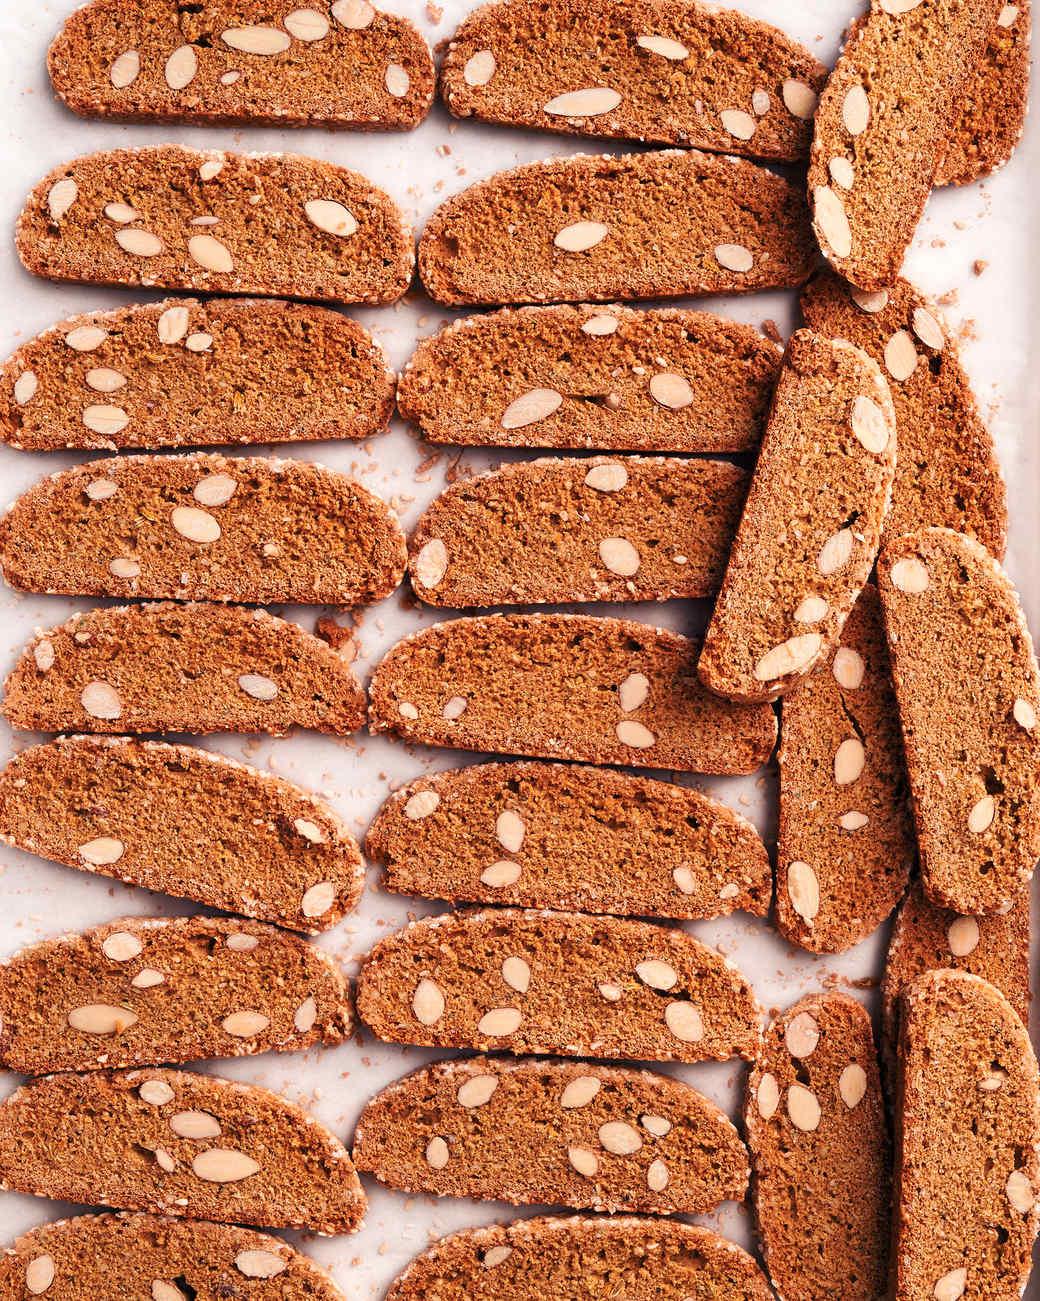 biscotti-005-d111788.jpg